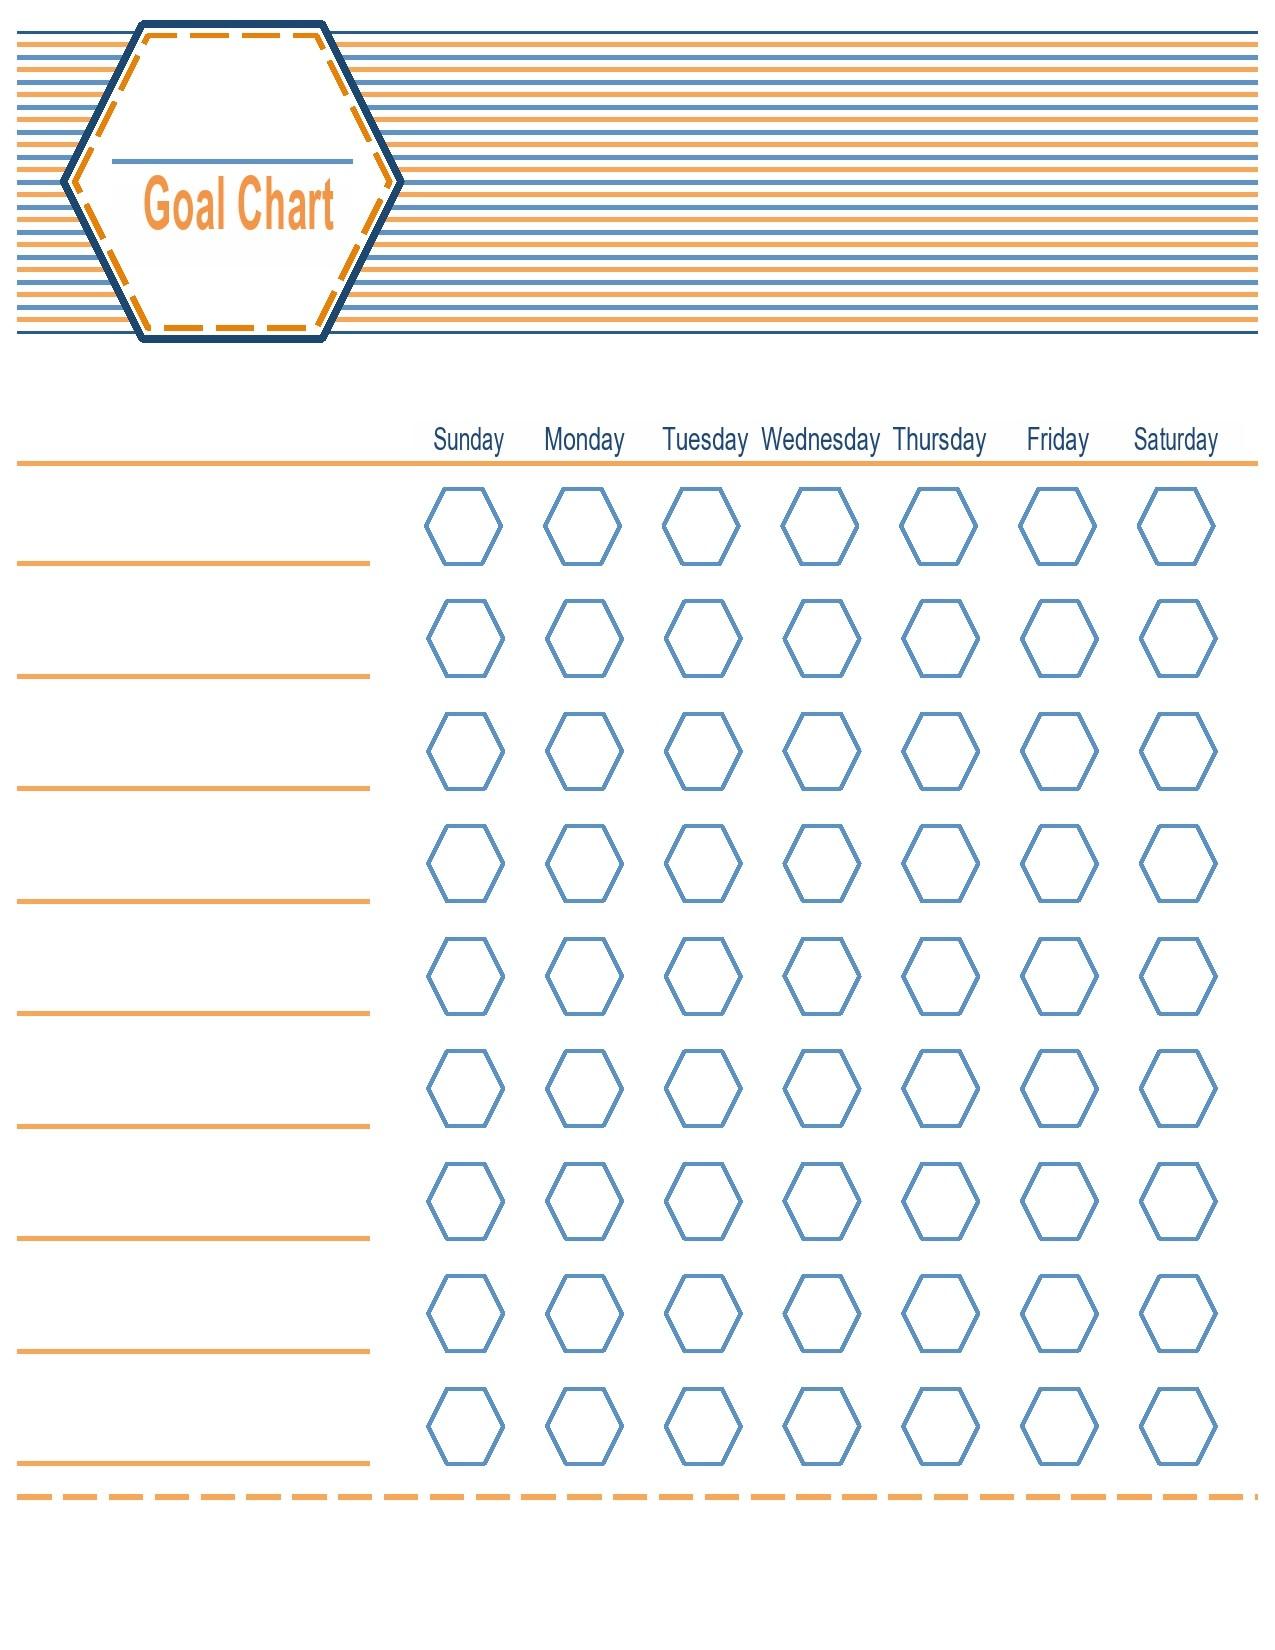 Free goal chart template 05